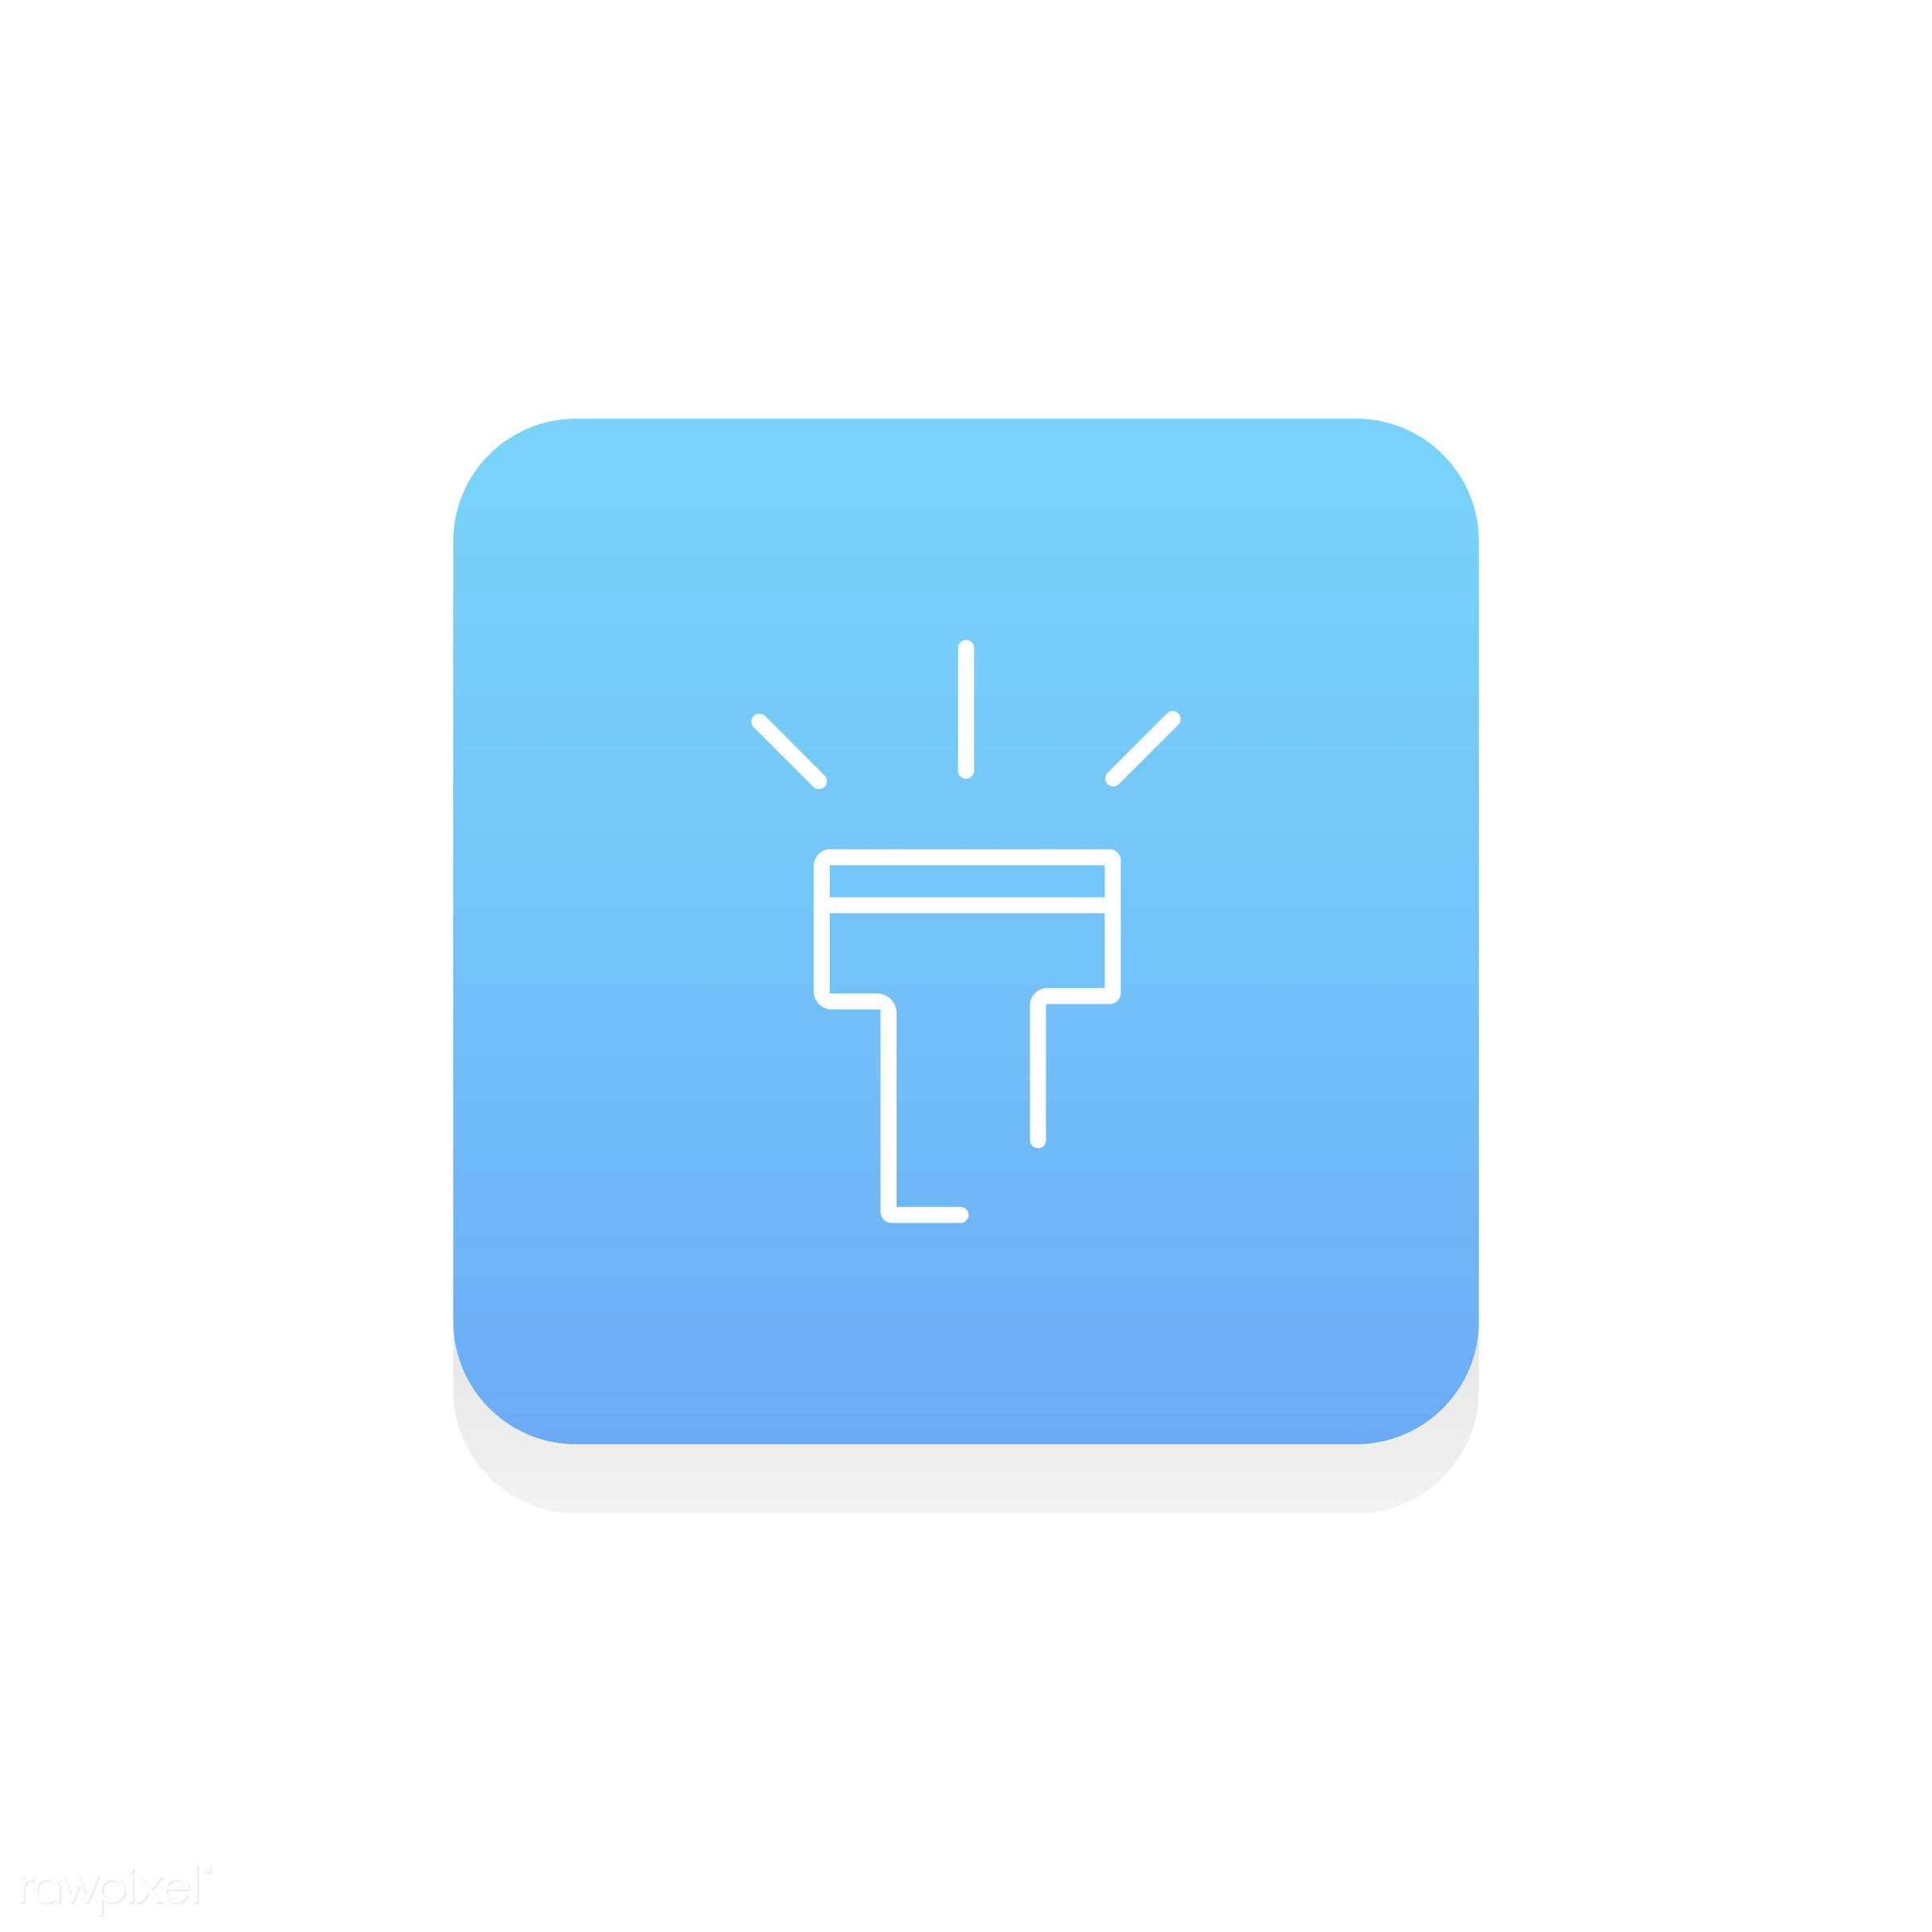 Vector of flashlight icon - adventure, bright, camping, design, energy, equipment, explore, flashlight, flat, graphic, icon...